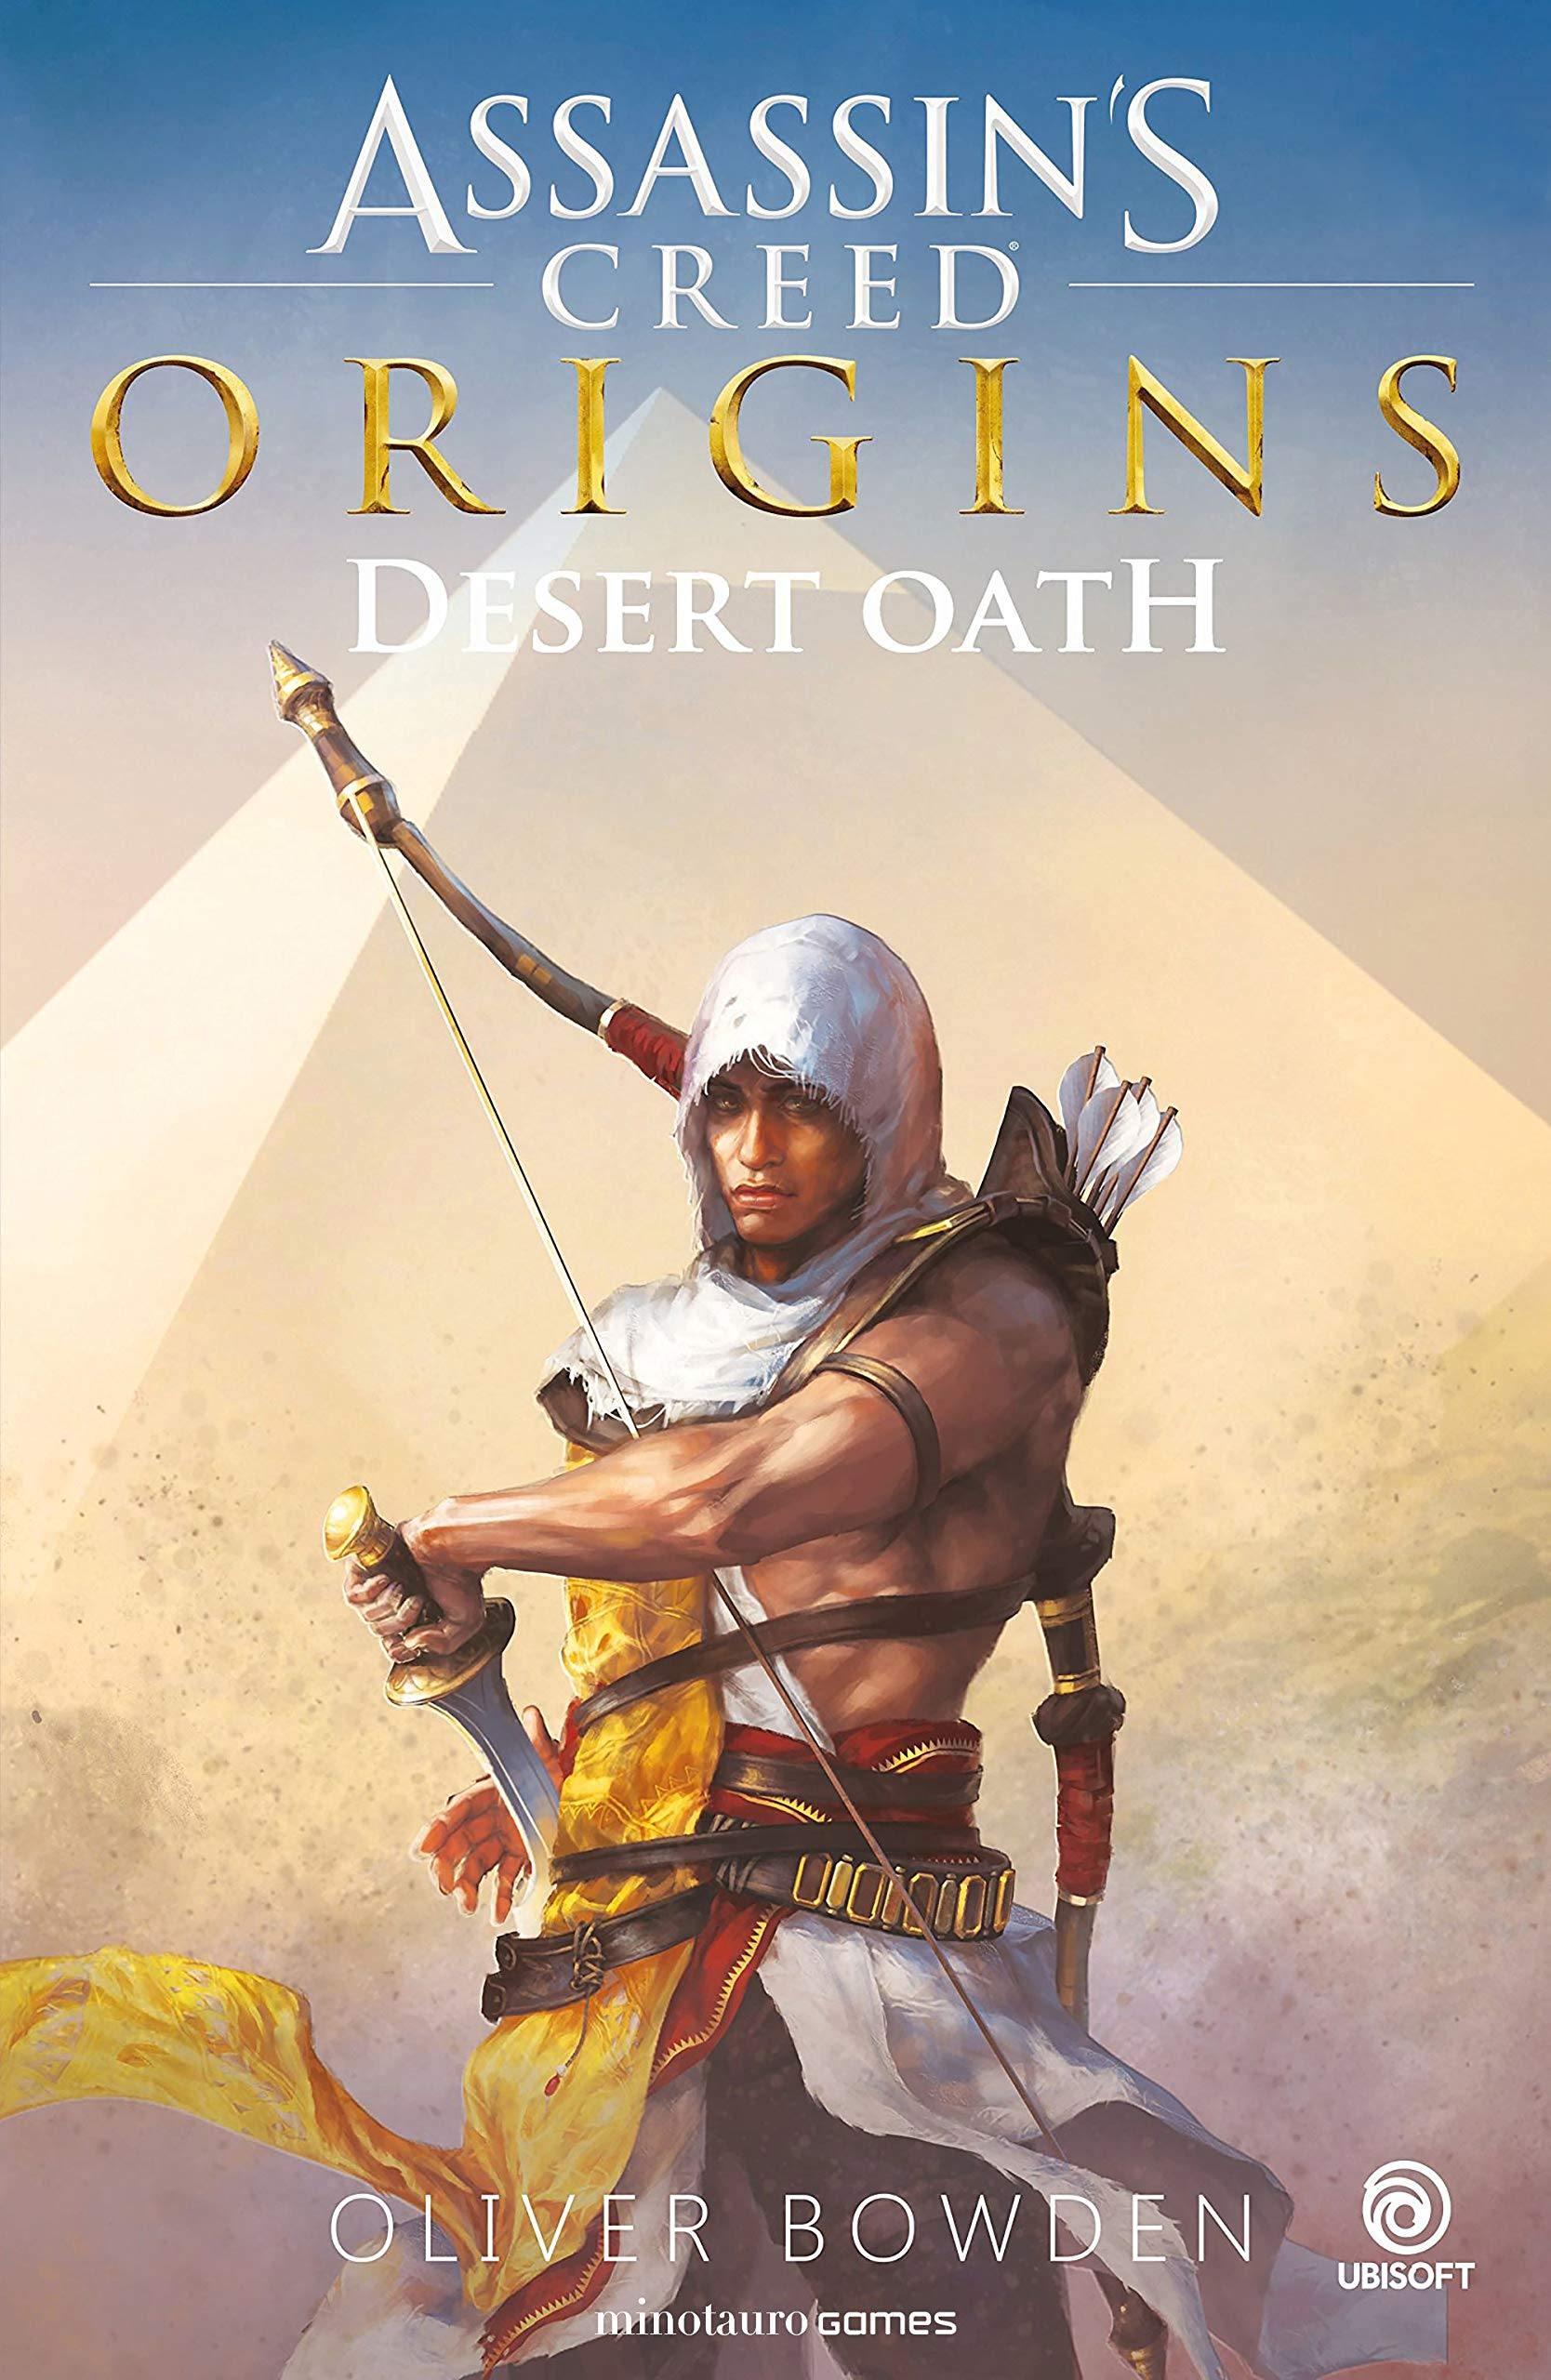 Assassin's Creed Origins: Desert Oath (Minotauro Games) Tapa blanda – 27 nov 2018 Diversos Autores 8445005987 Science fiction